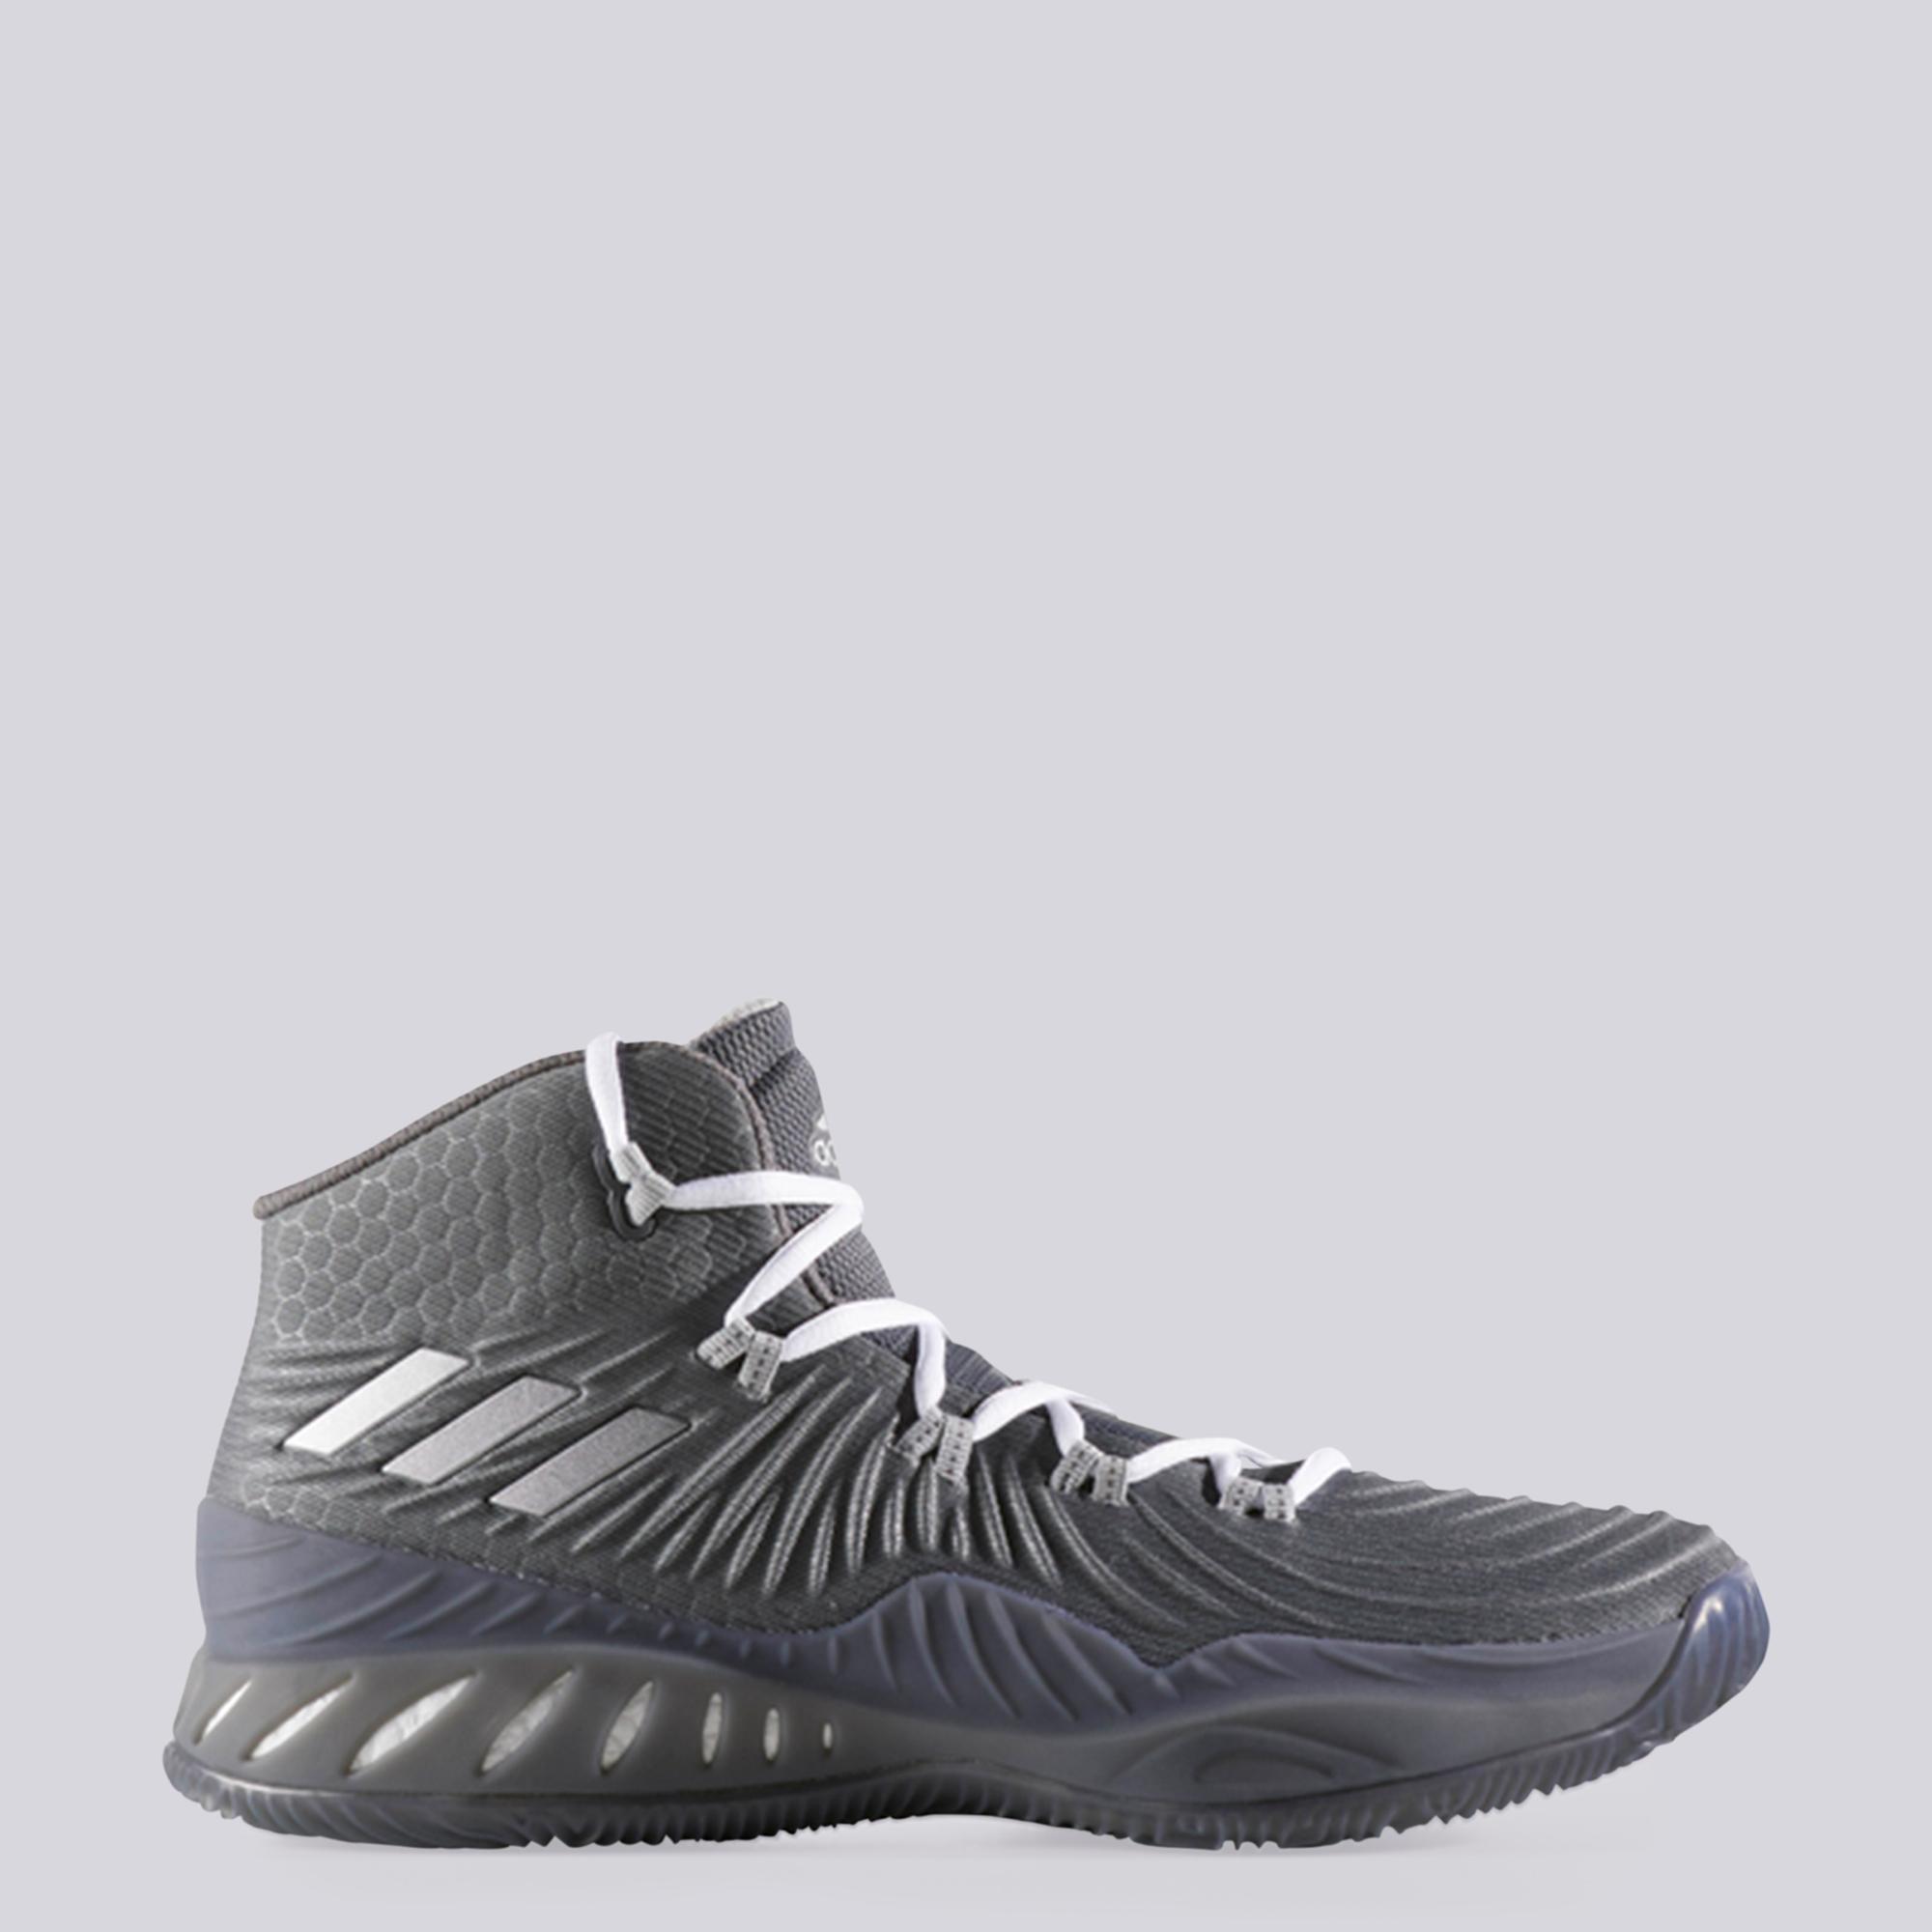 "Image of ""adidas Crazy Explosive 2017 Basketball Shoe - Core Grey - Mens"""